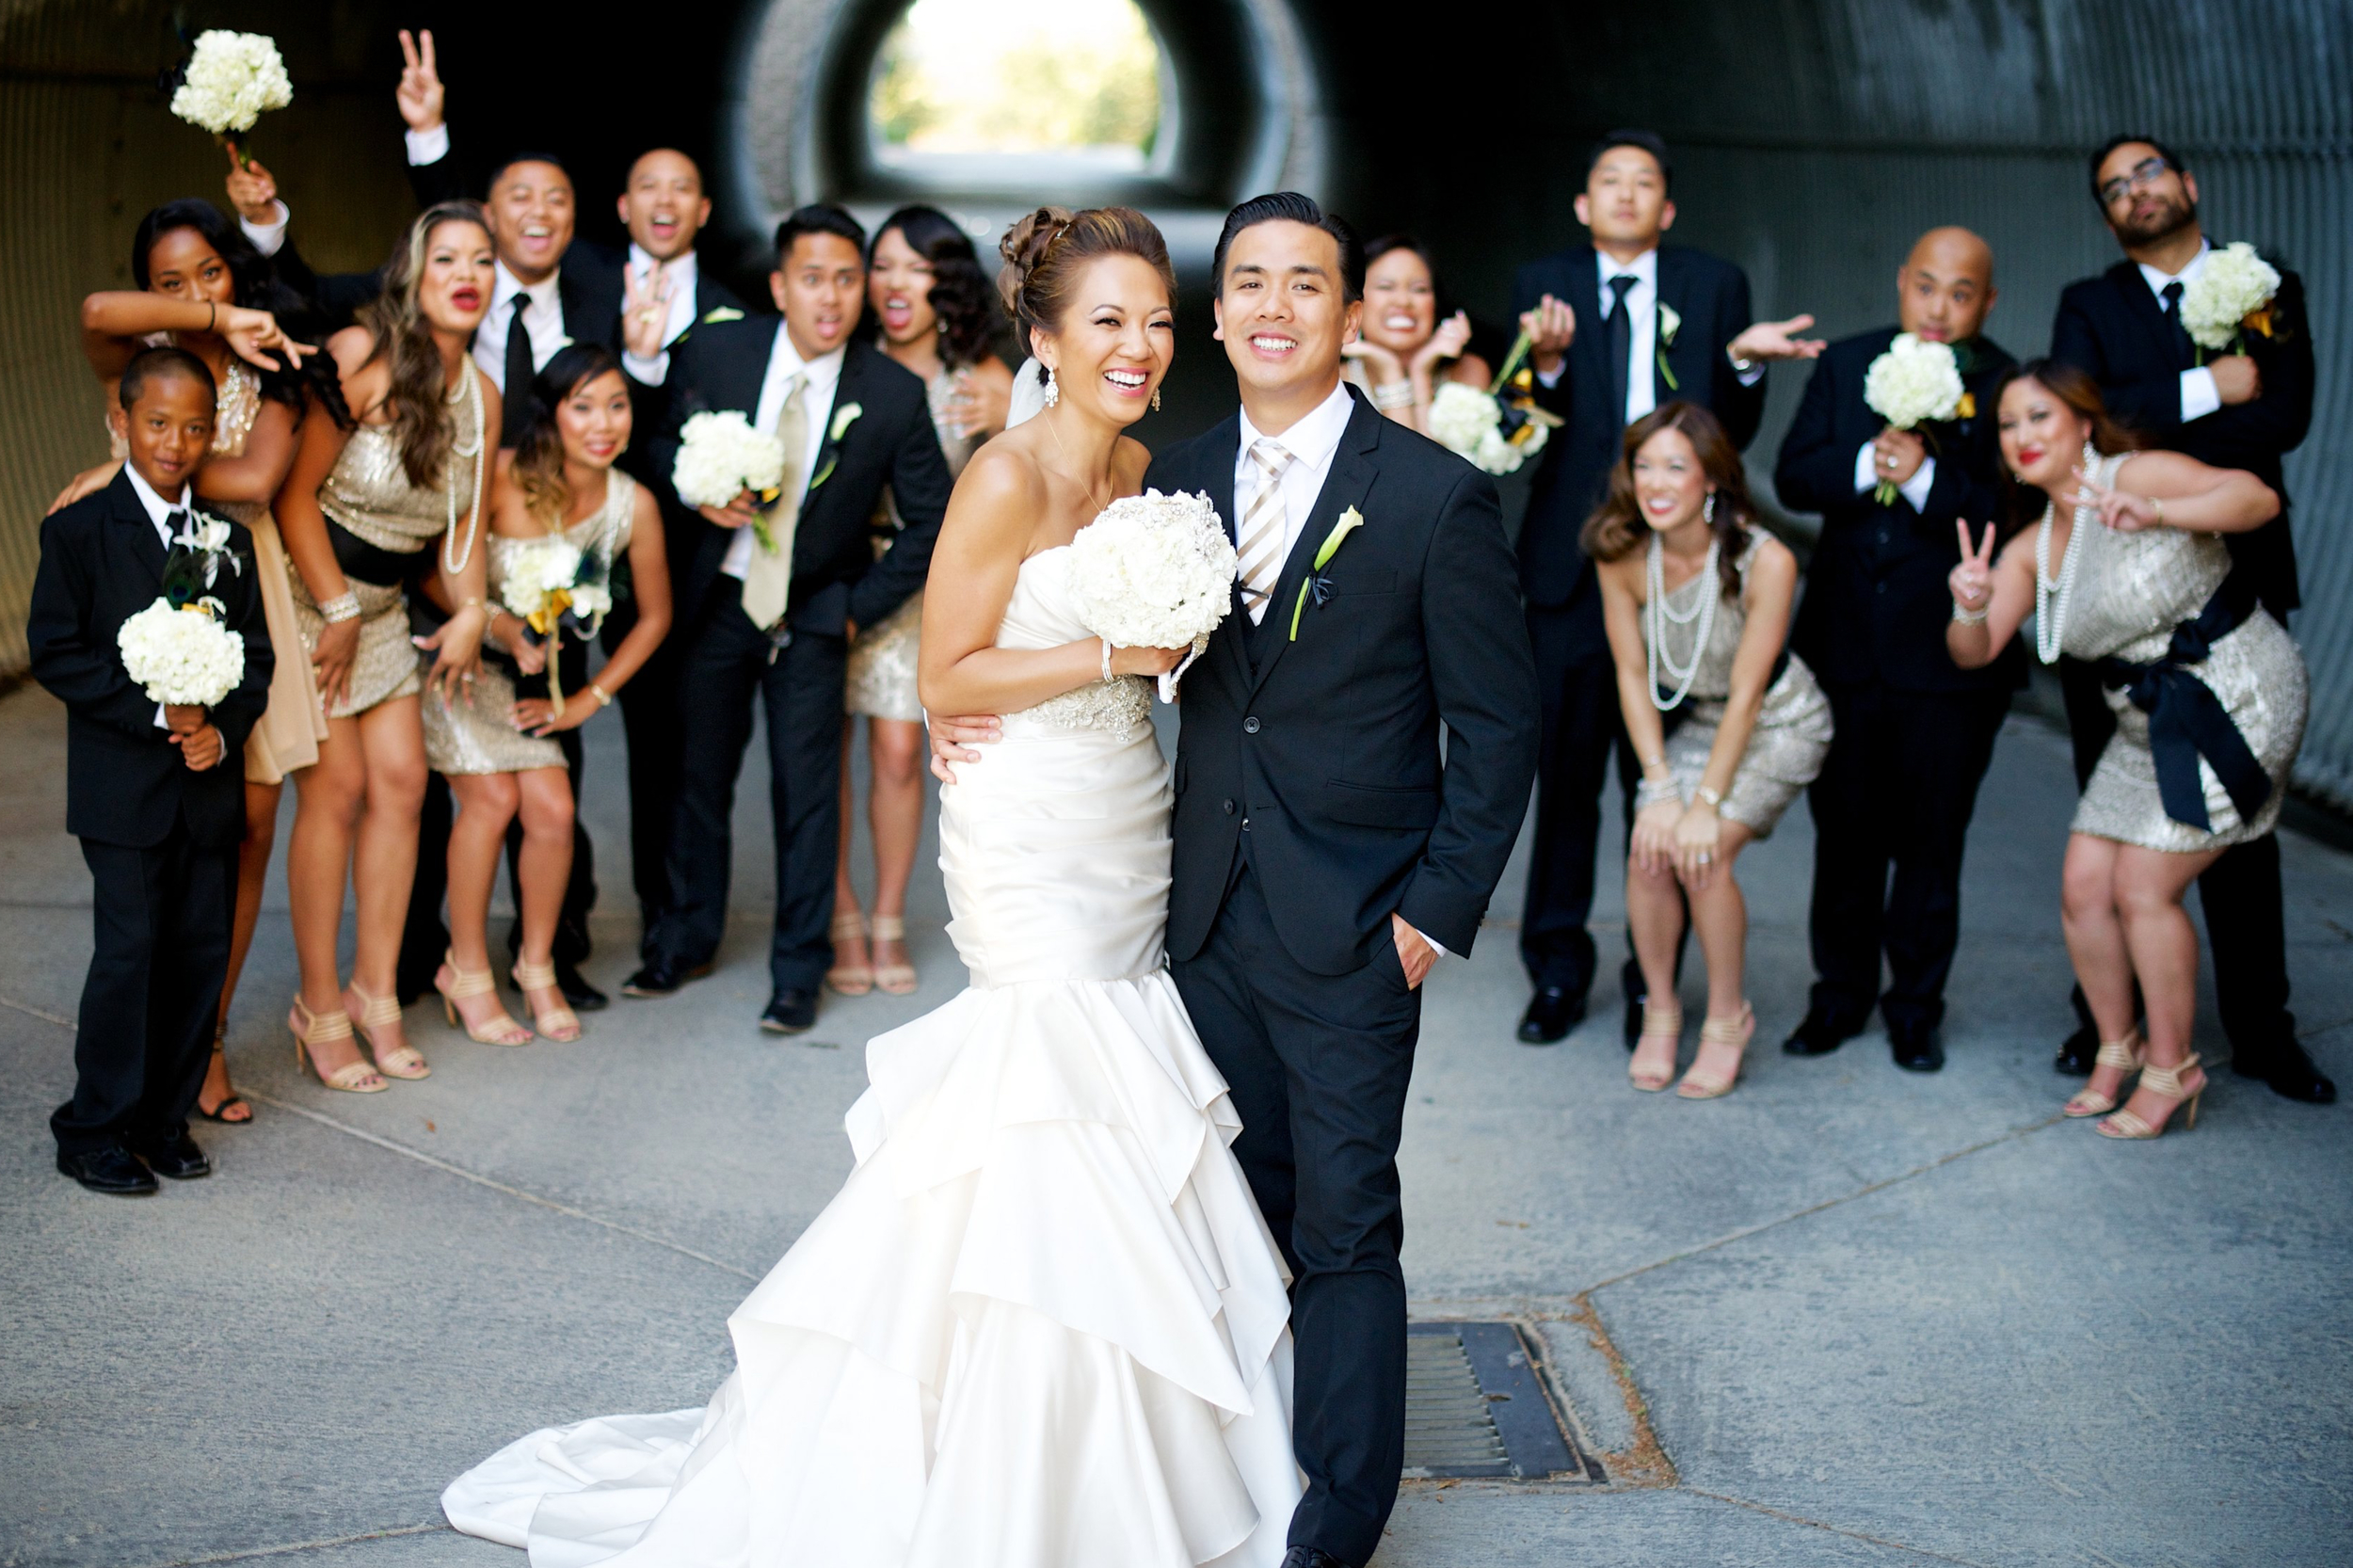 bernadus-lodge-wedding-carmel (1).jpg